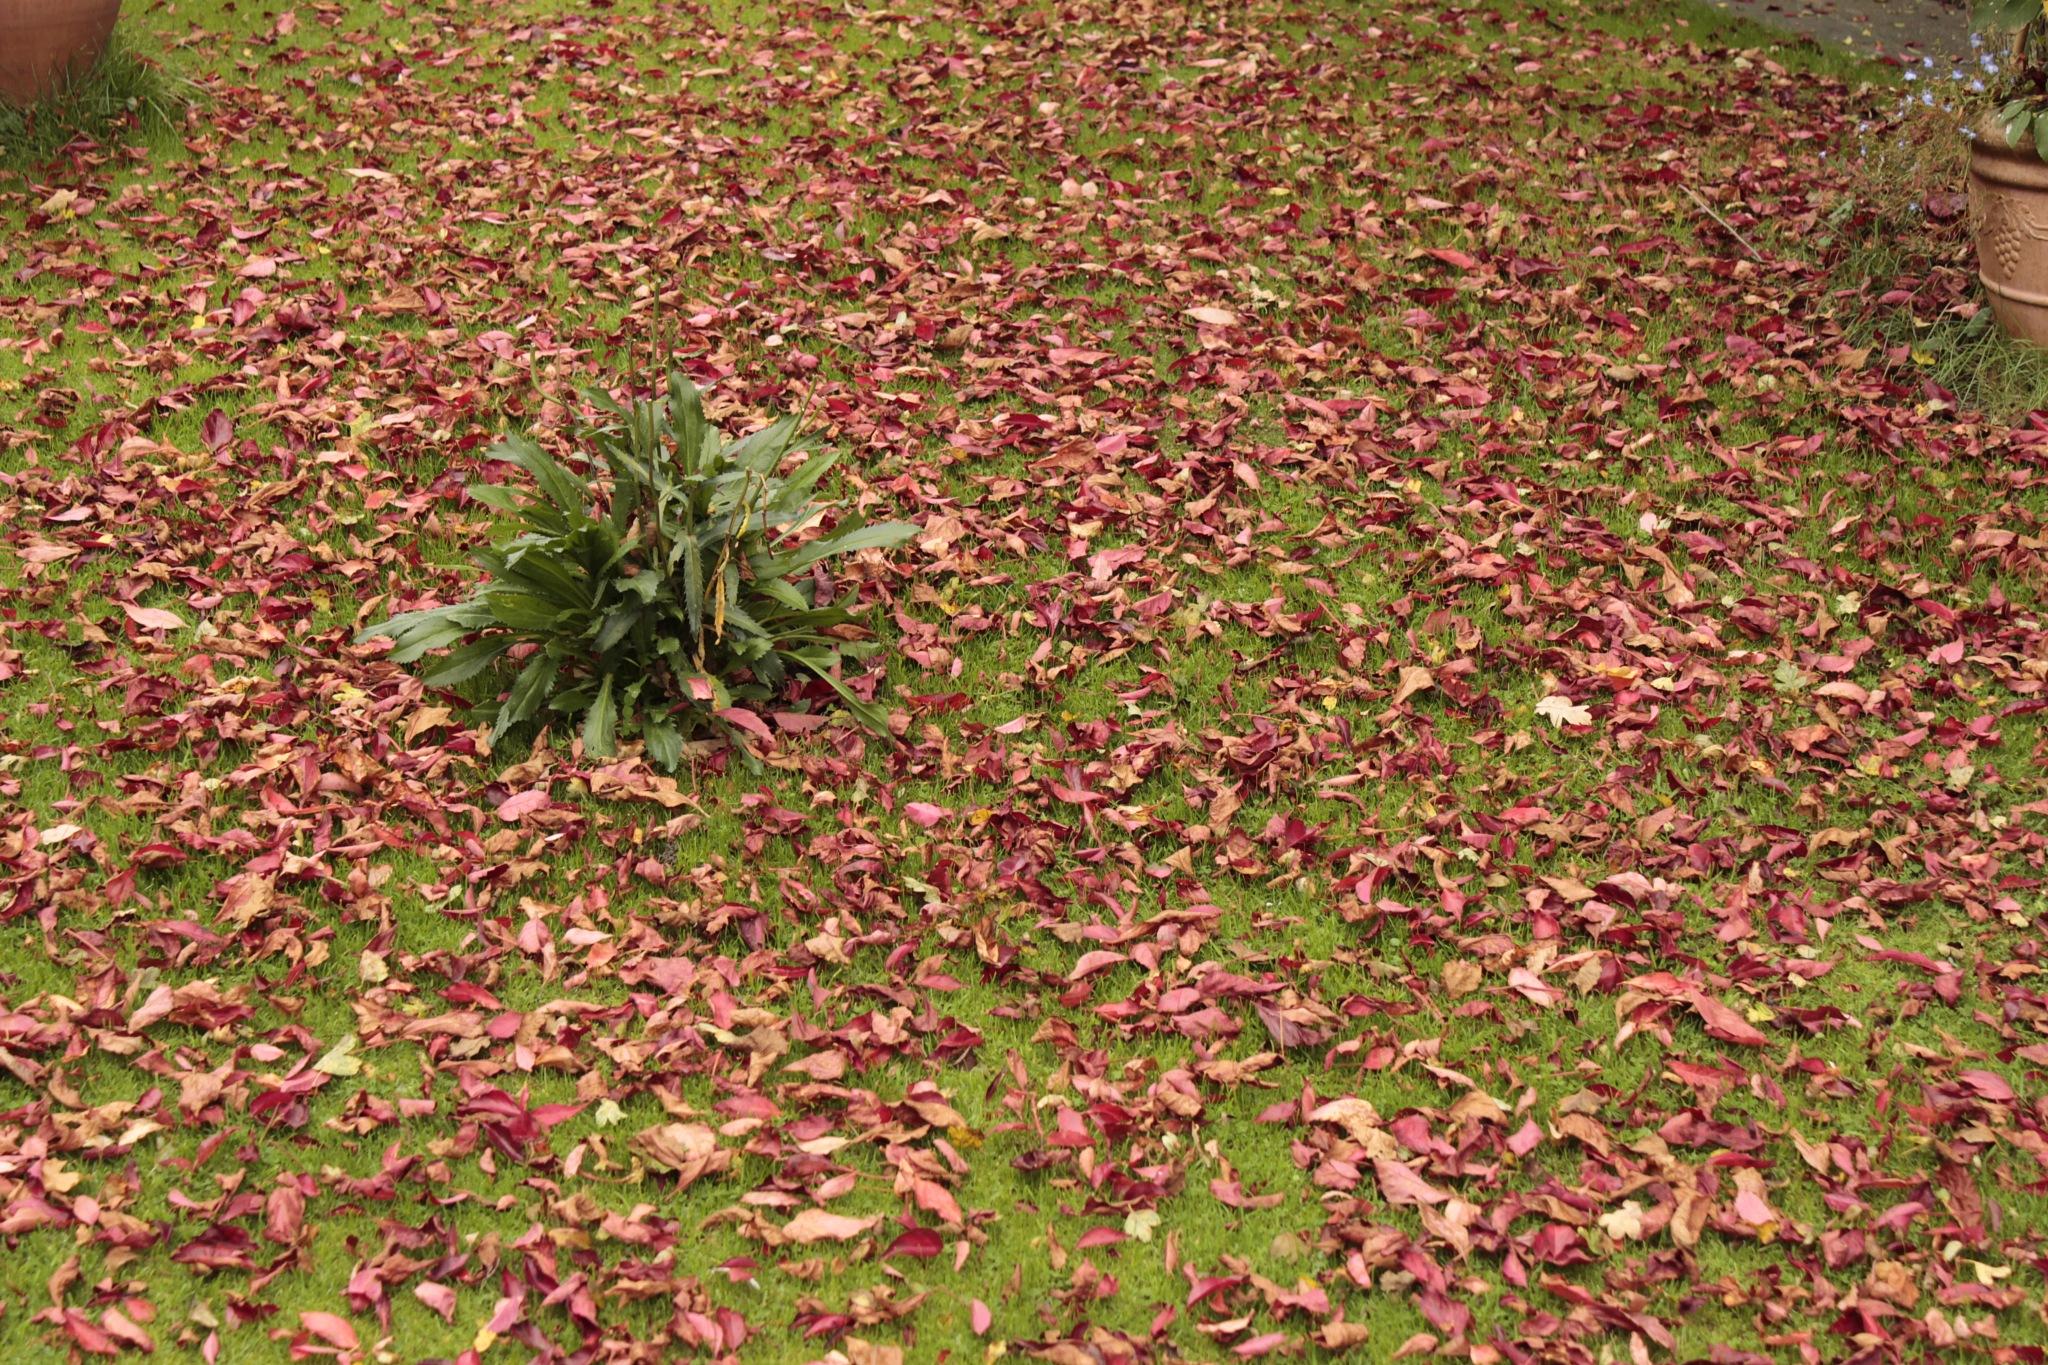 Autum leaves by yrref